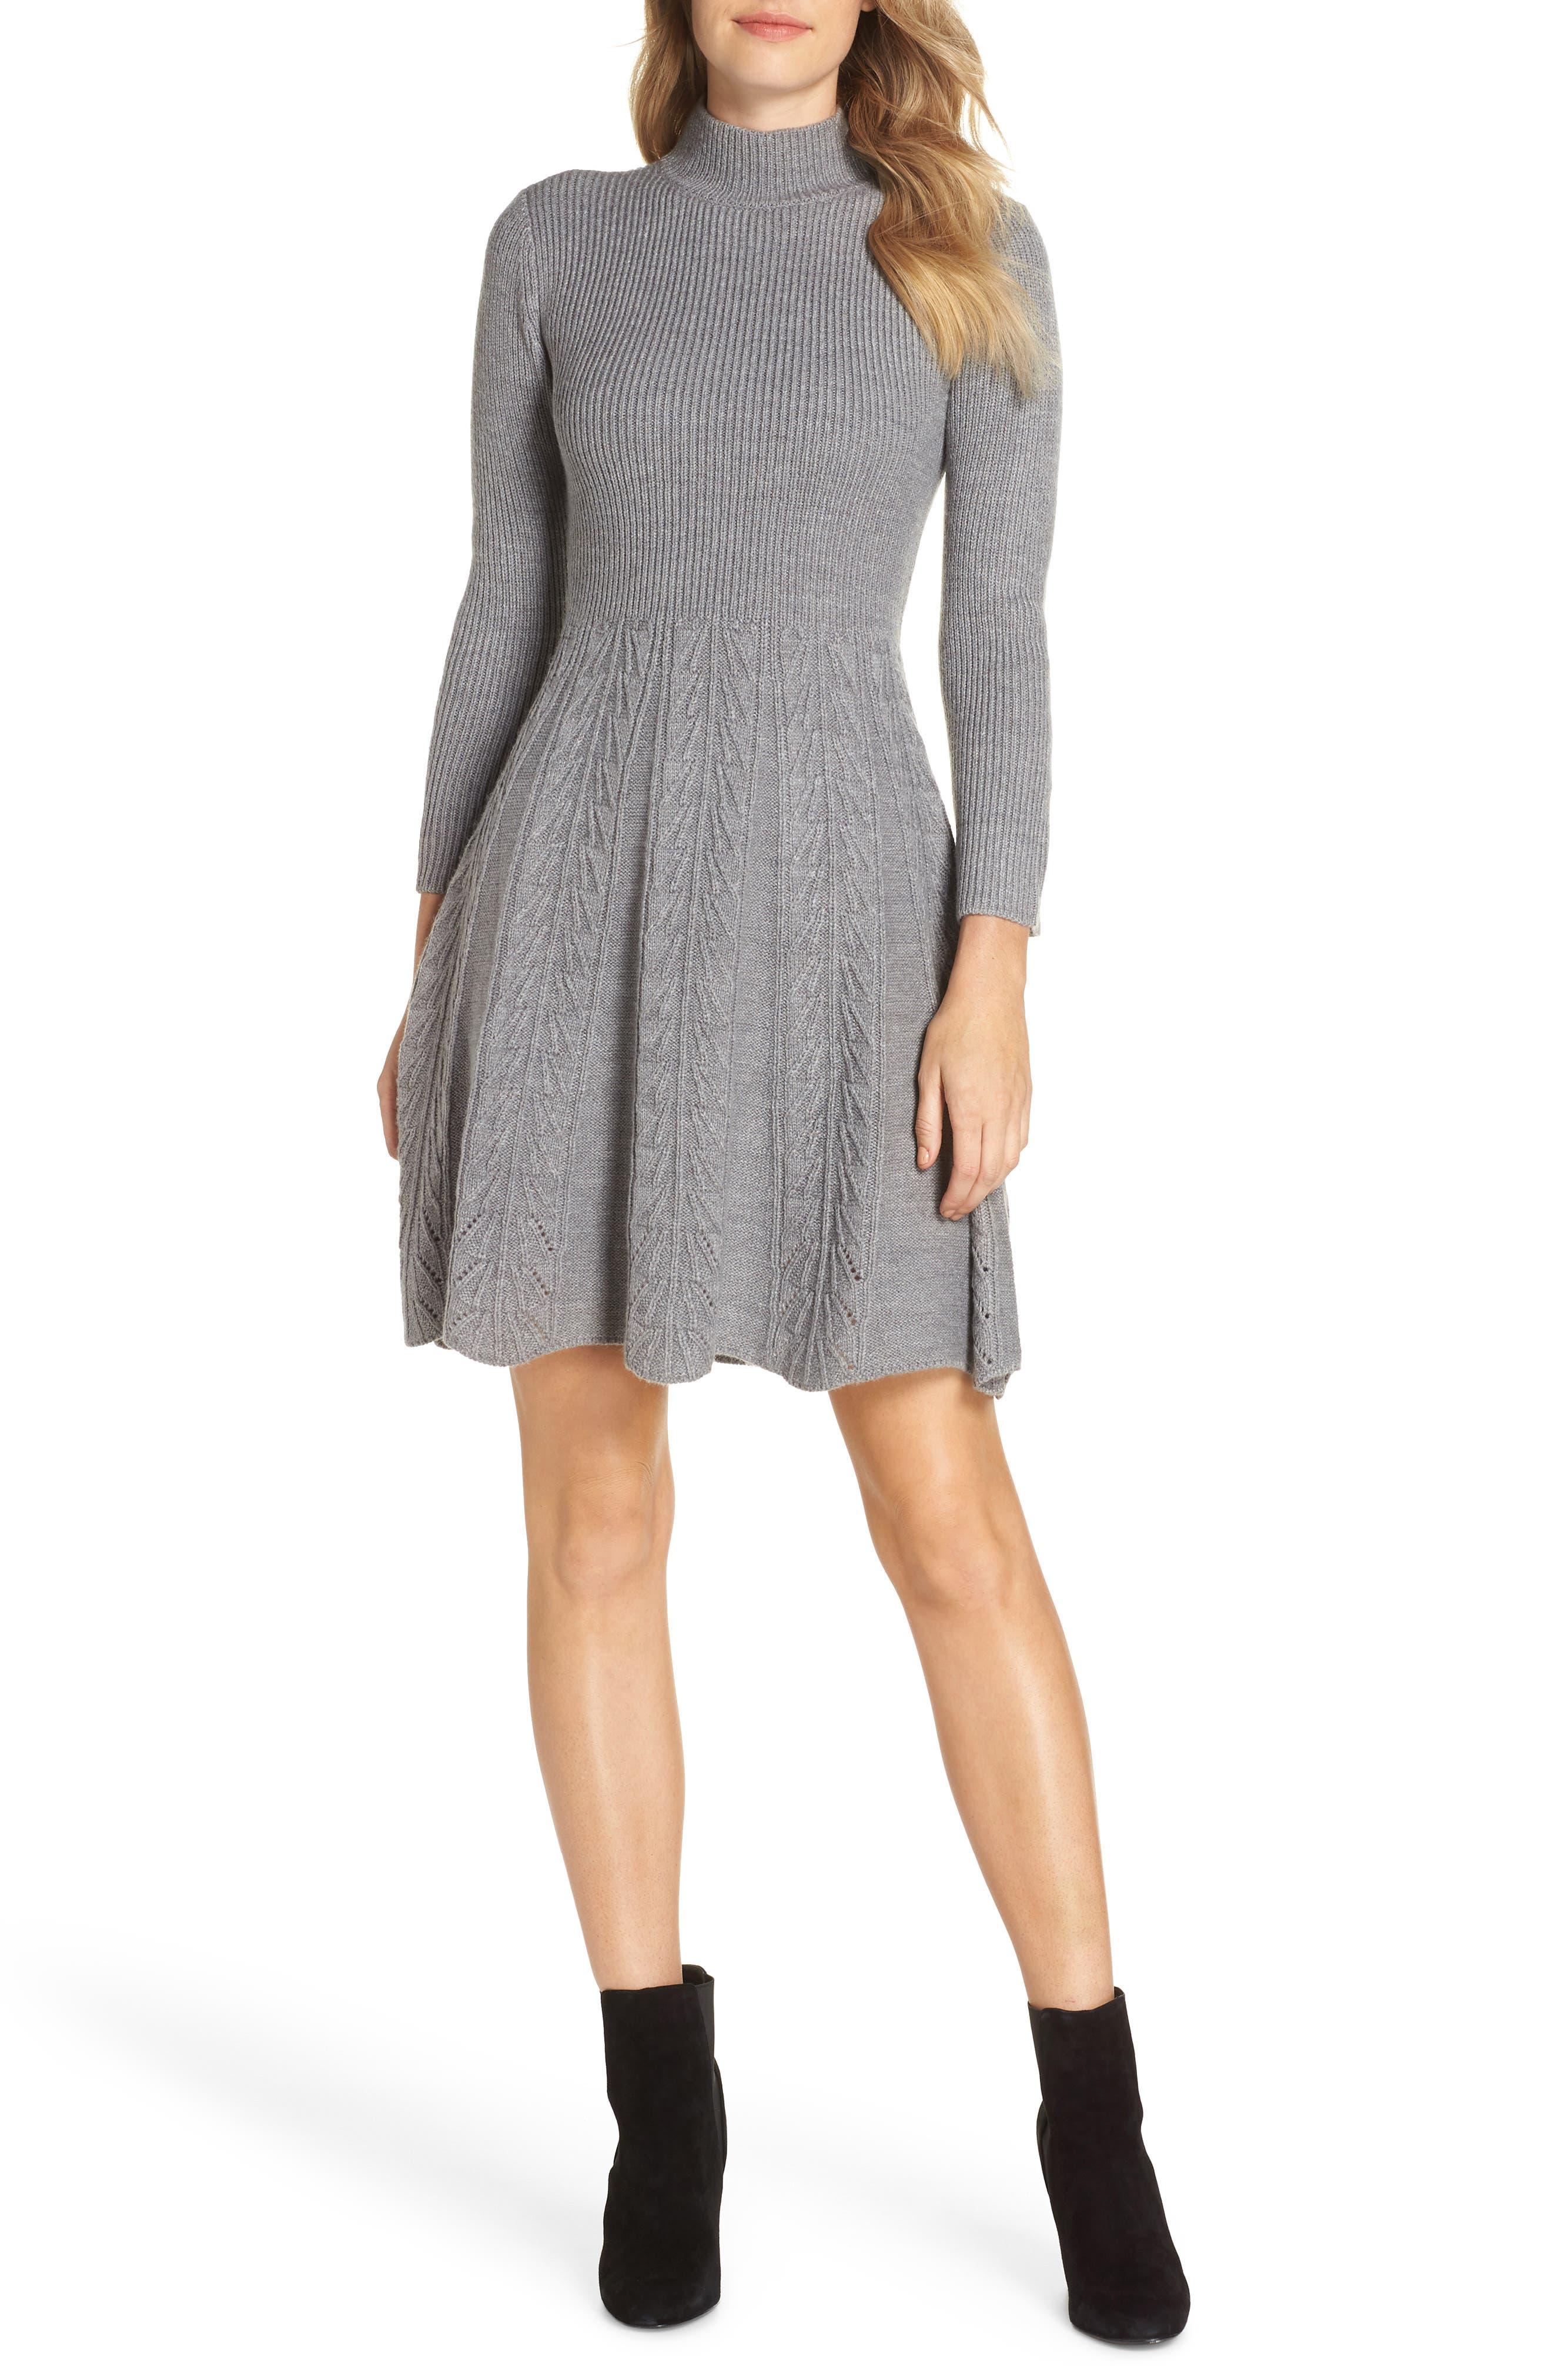 ELIZA J, Mock Neck Fit & Flare Sweater Dress, Main thumbnail 1, color, 030